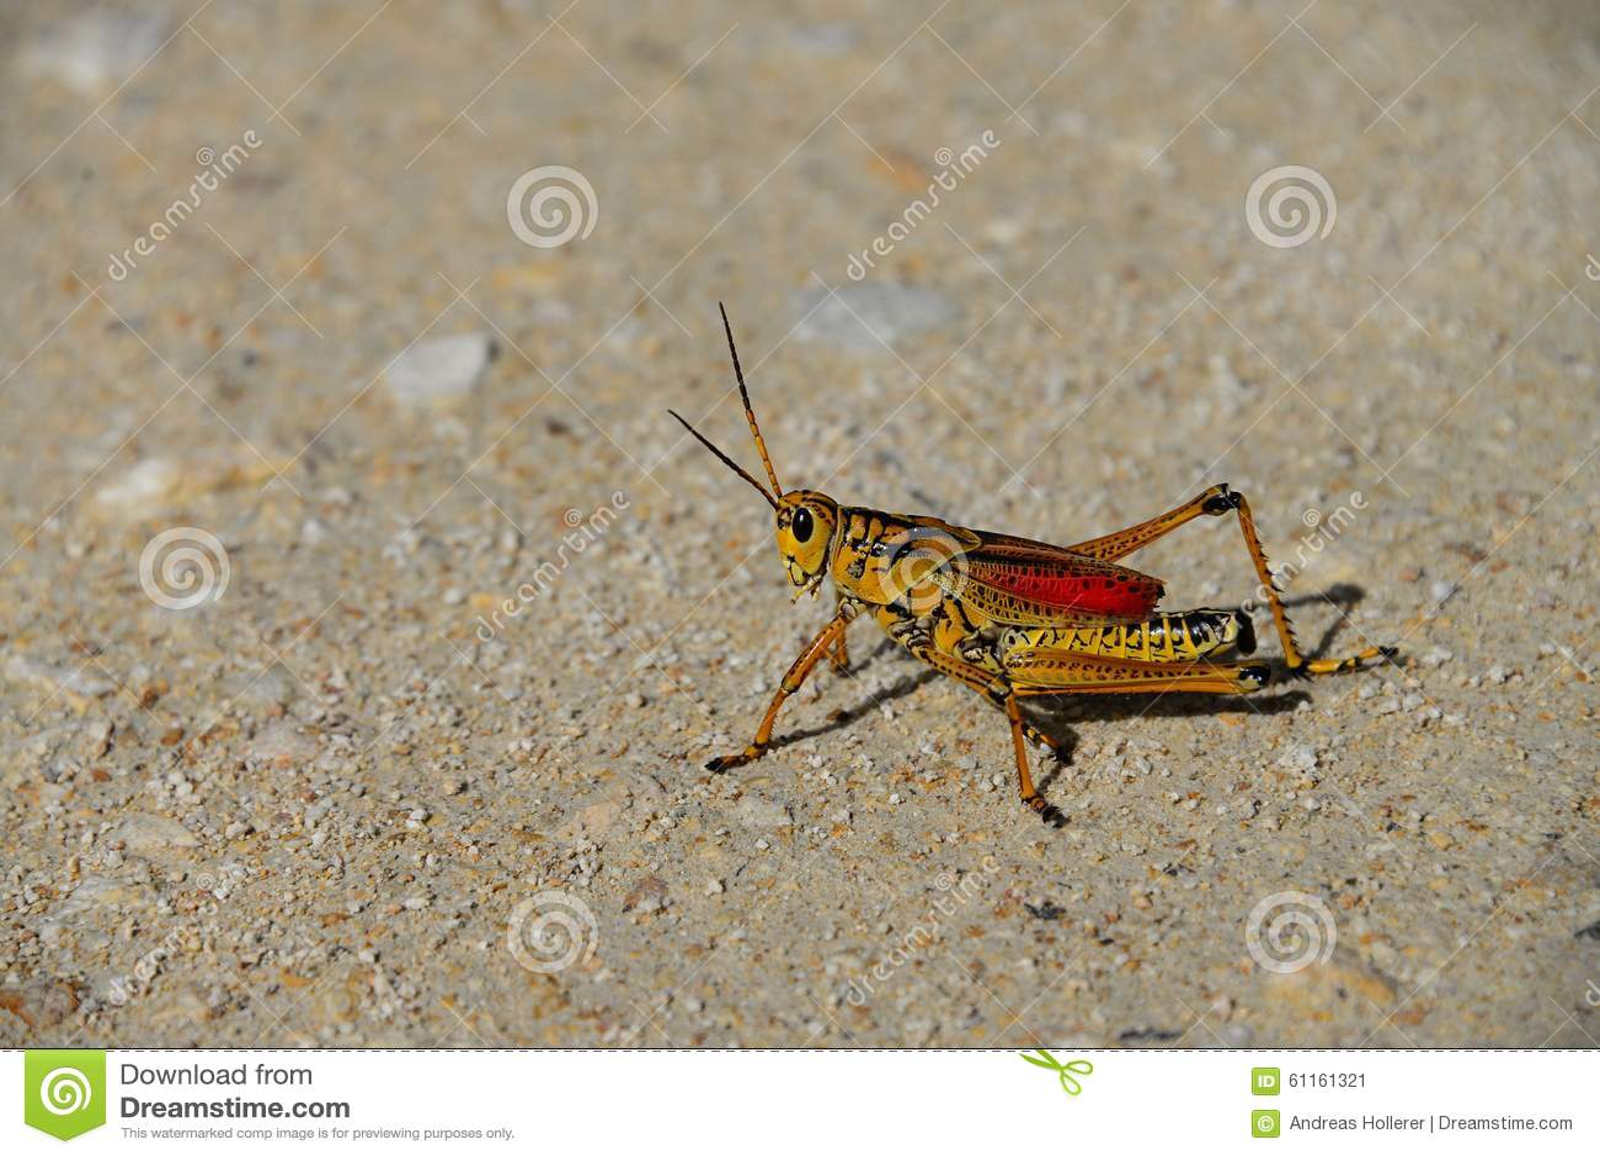 Giant Grasshopper Florida Pictures to Pin on Pinterest ...